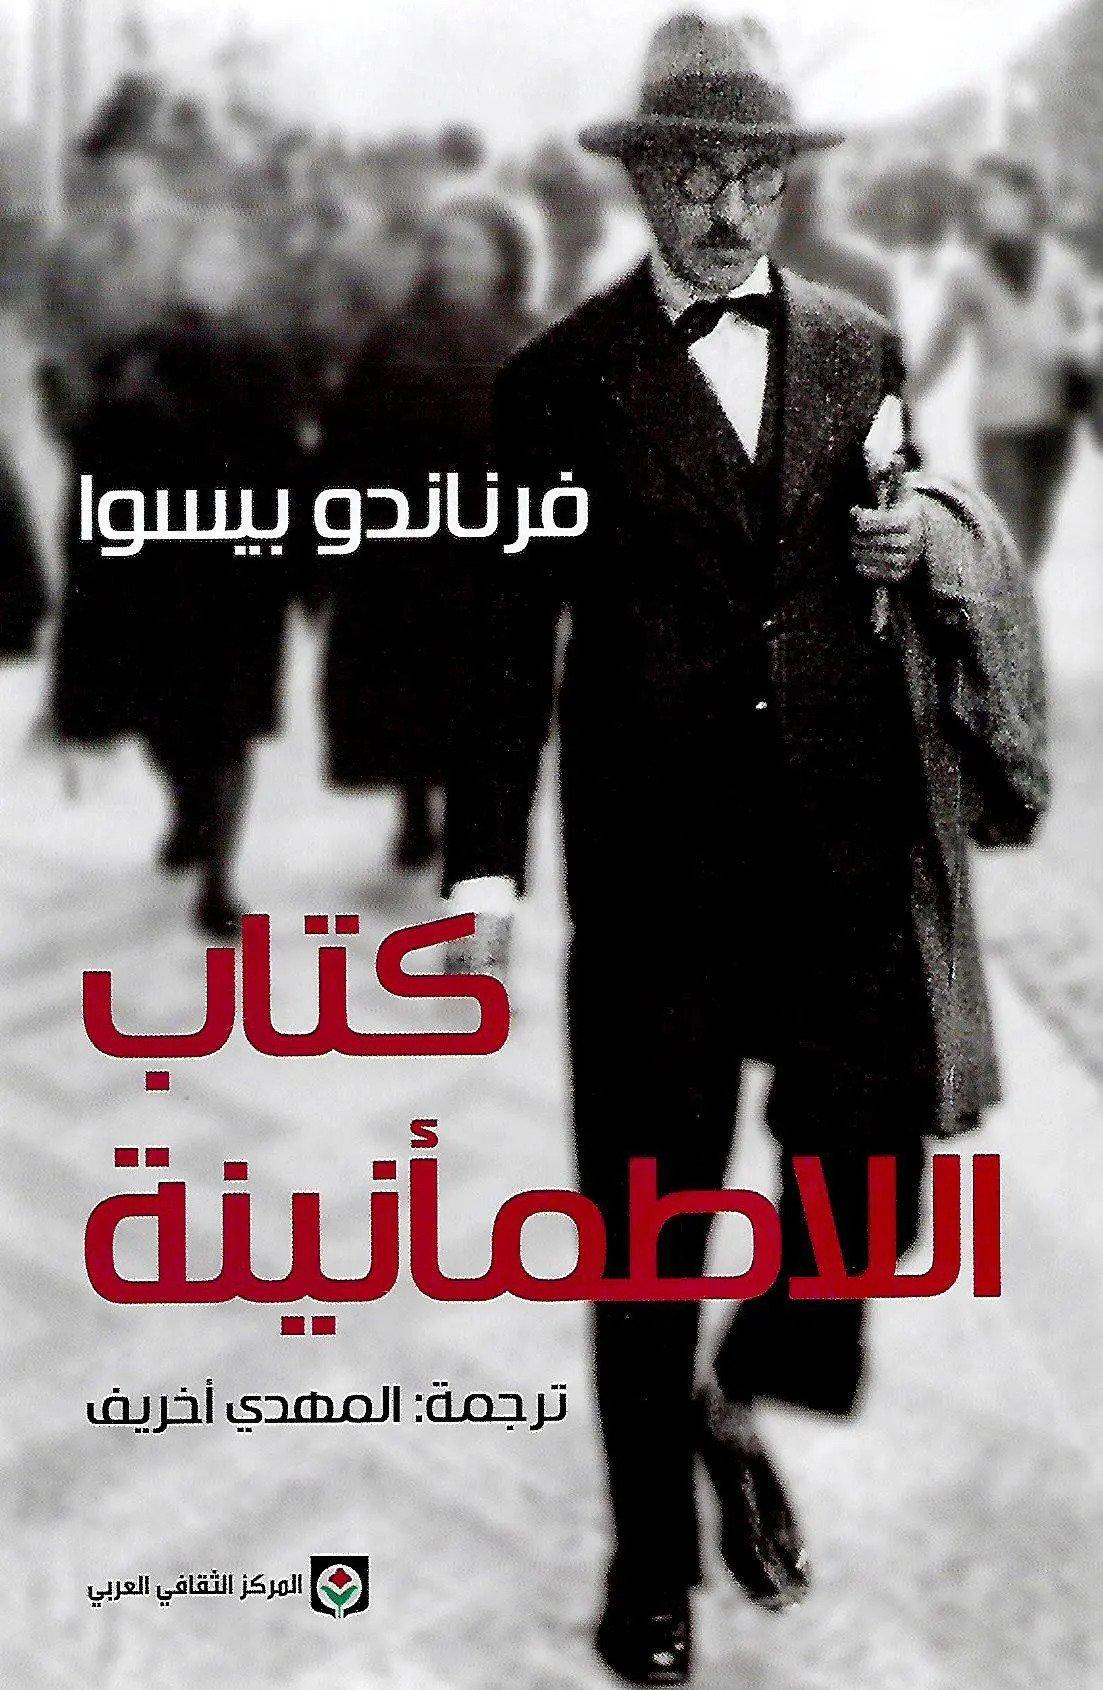 Photo of تحميل كتاب اللاطمأنينة فرناندو بيسوا pdf